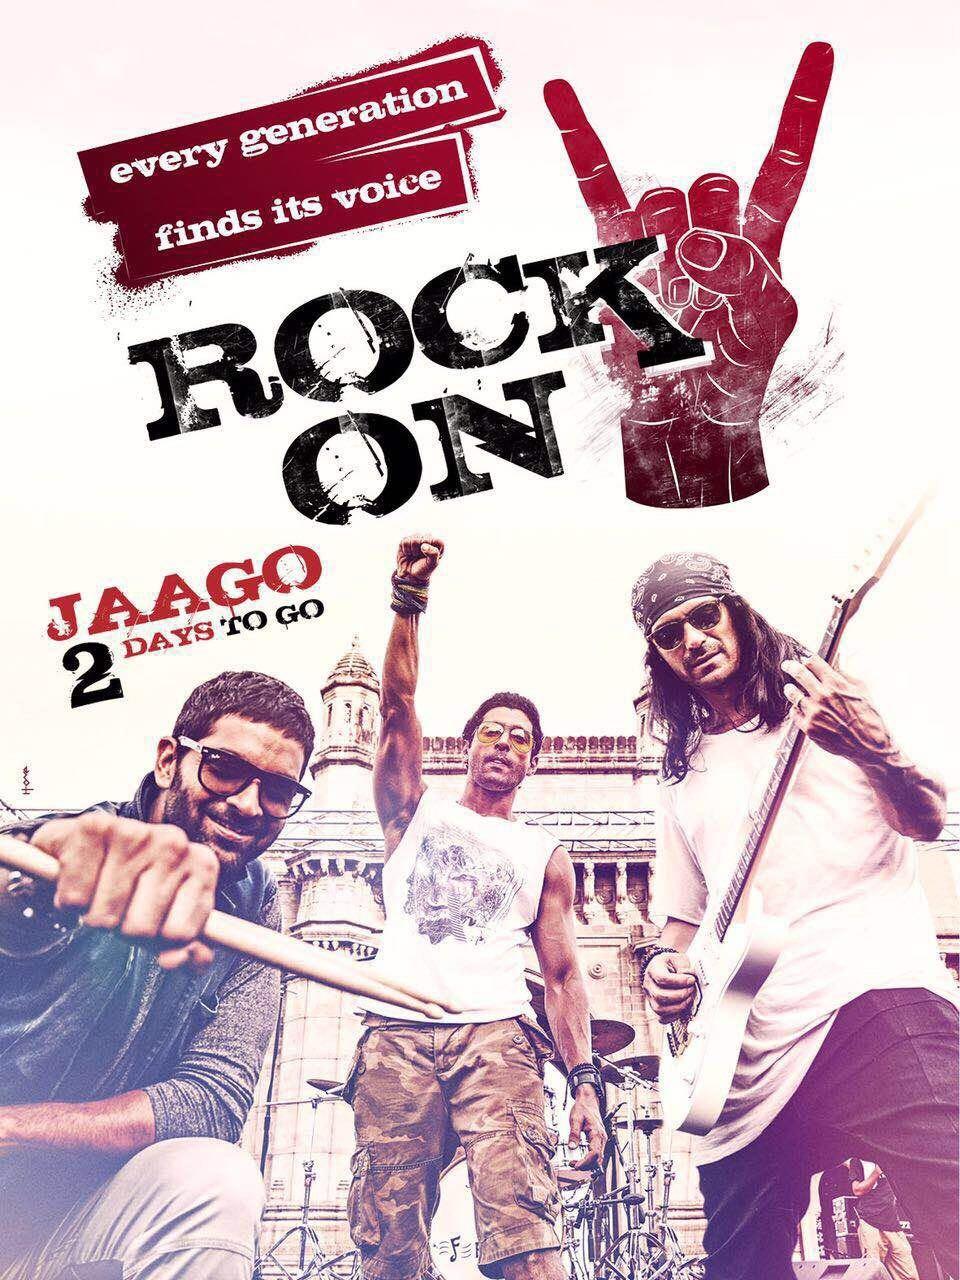 Rock On 2,bollywood movie Rock On 2,Rock On 2 first look,Rock On 2 first look poster,Rock On 2 poster,Farhan Akhtar,Arjun Rampal,Purab Kohli,Shraddha Kapoor